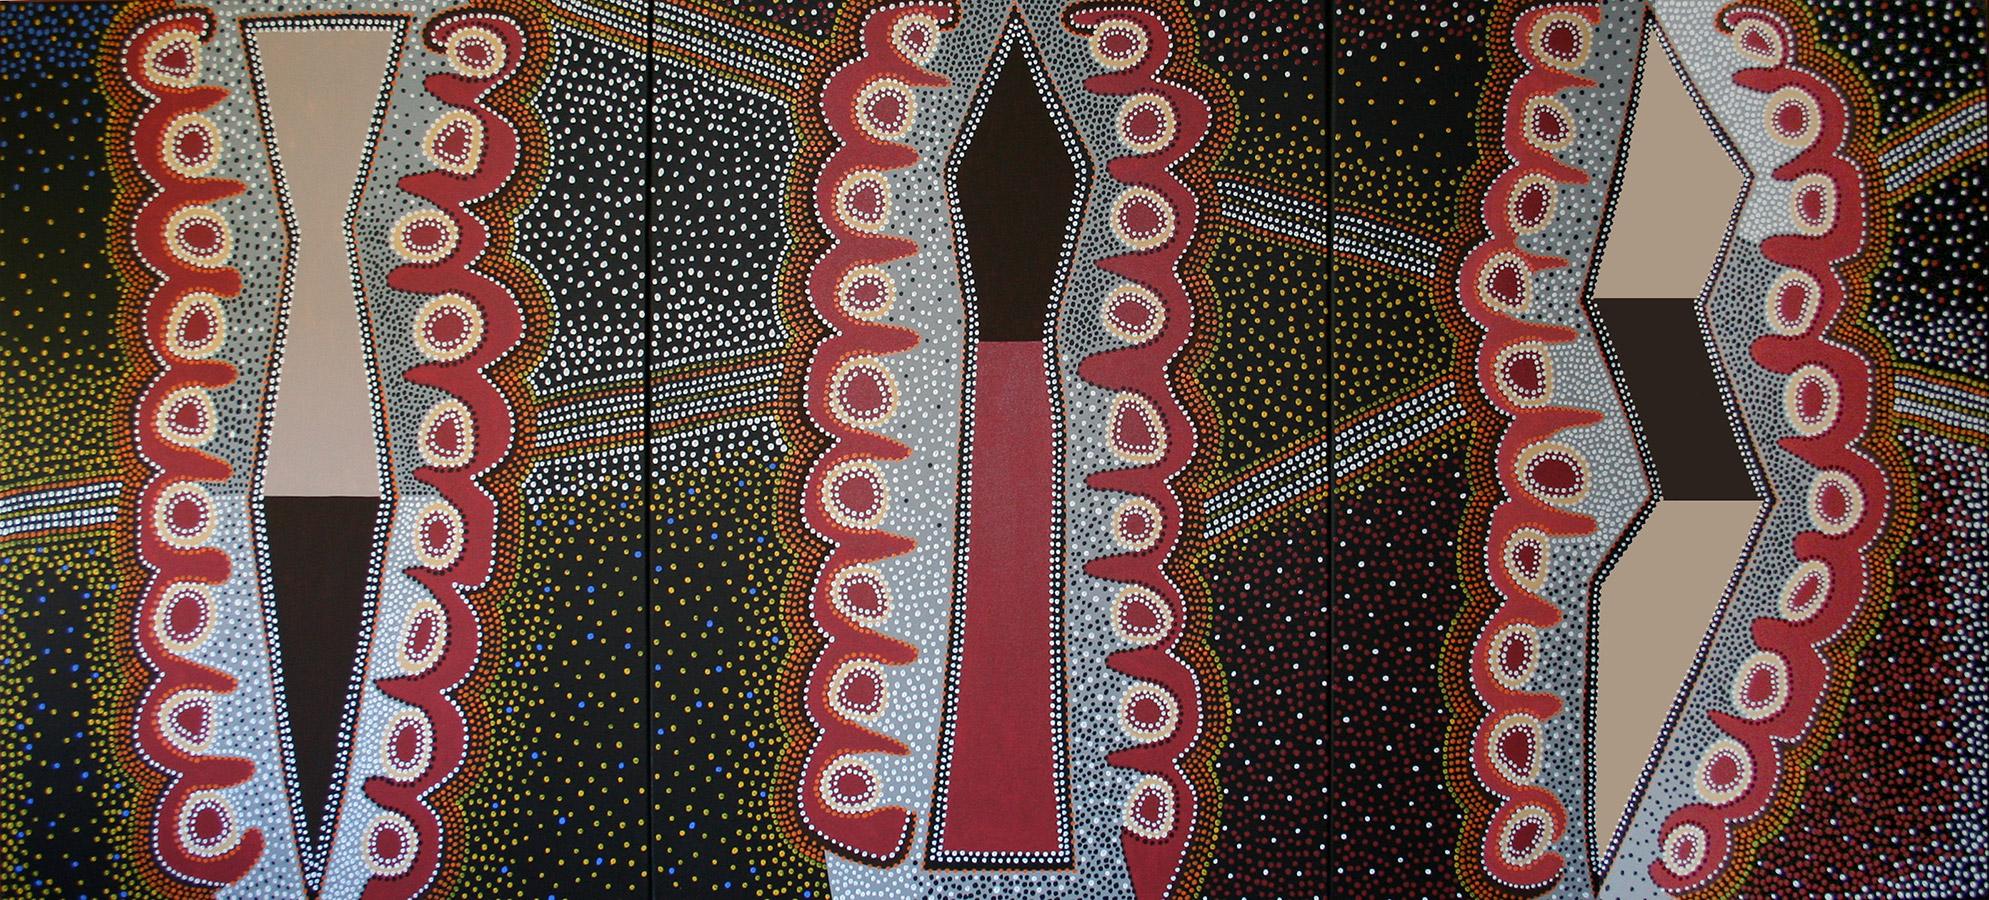 "Three Totems, acrylic on canvas, 48"" x 108"", 2000"